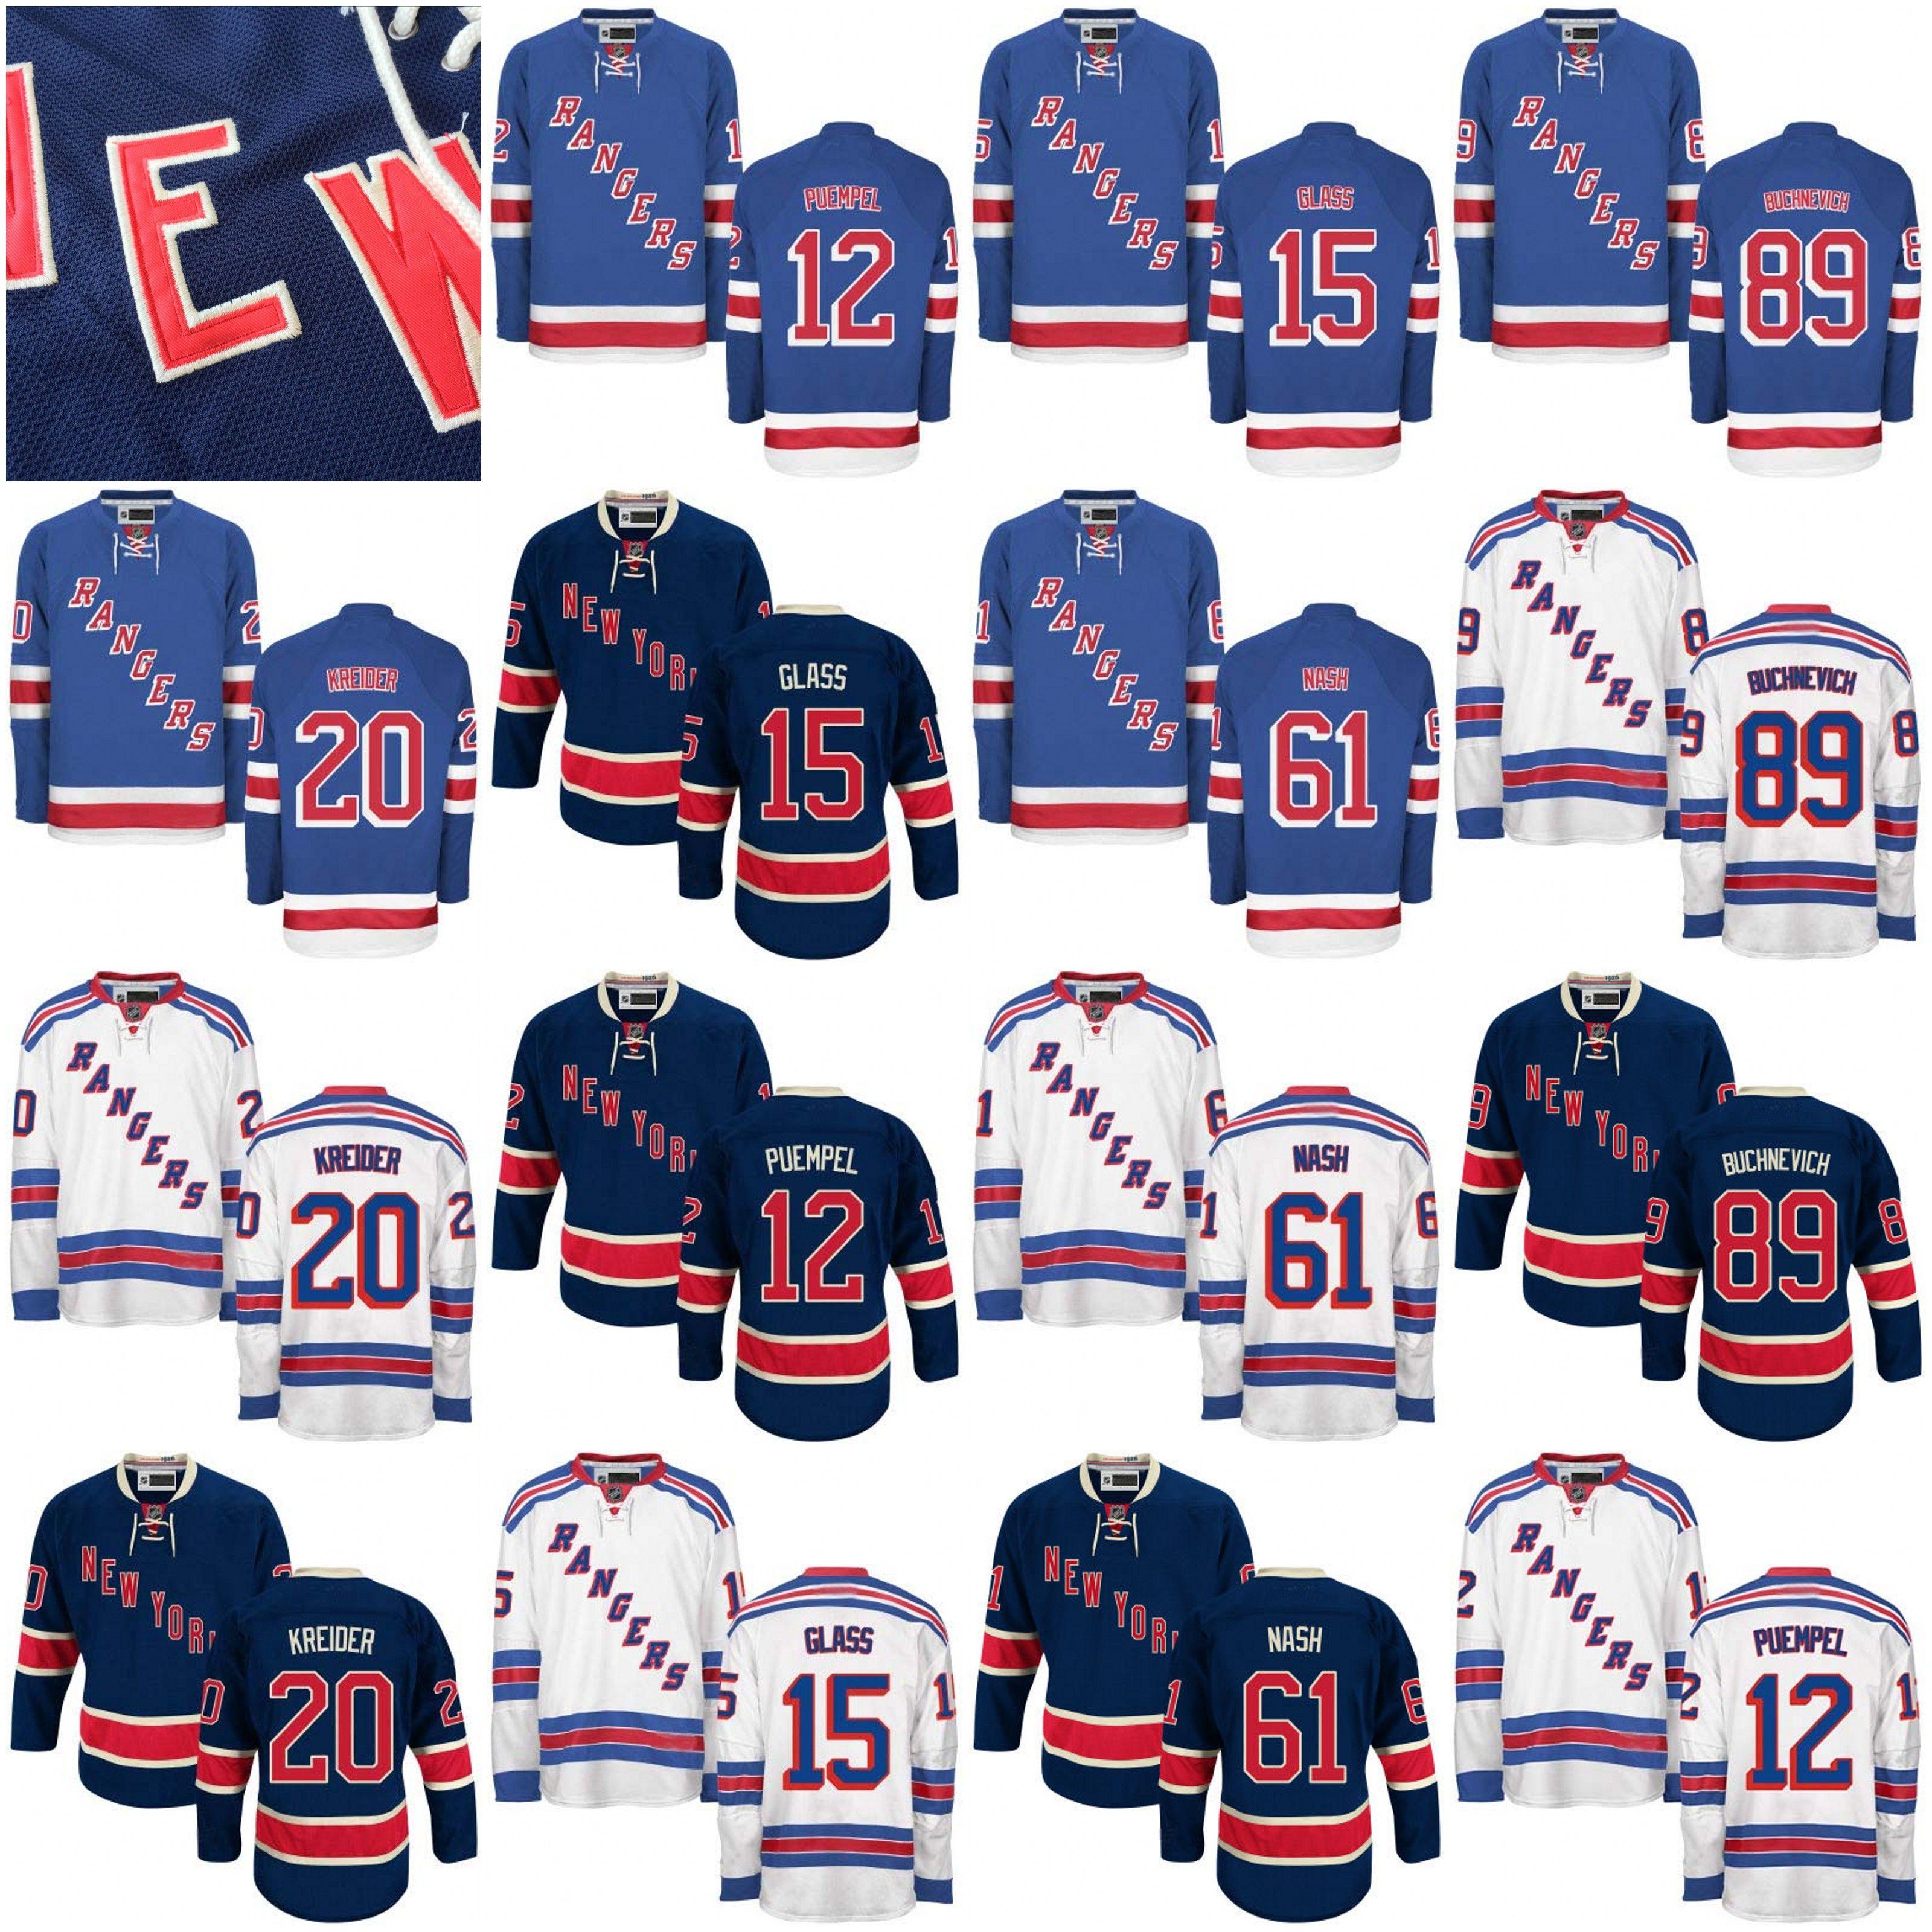 35c7bfa88 ... 2017 2017 New York Rangers Hockey Jerseys 89 Pavel Buchnevich 15 Tanner  Glass 20 Chris Kreider Kids Reebok ...